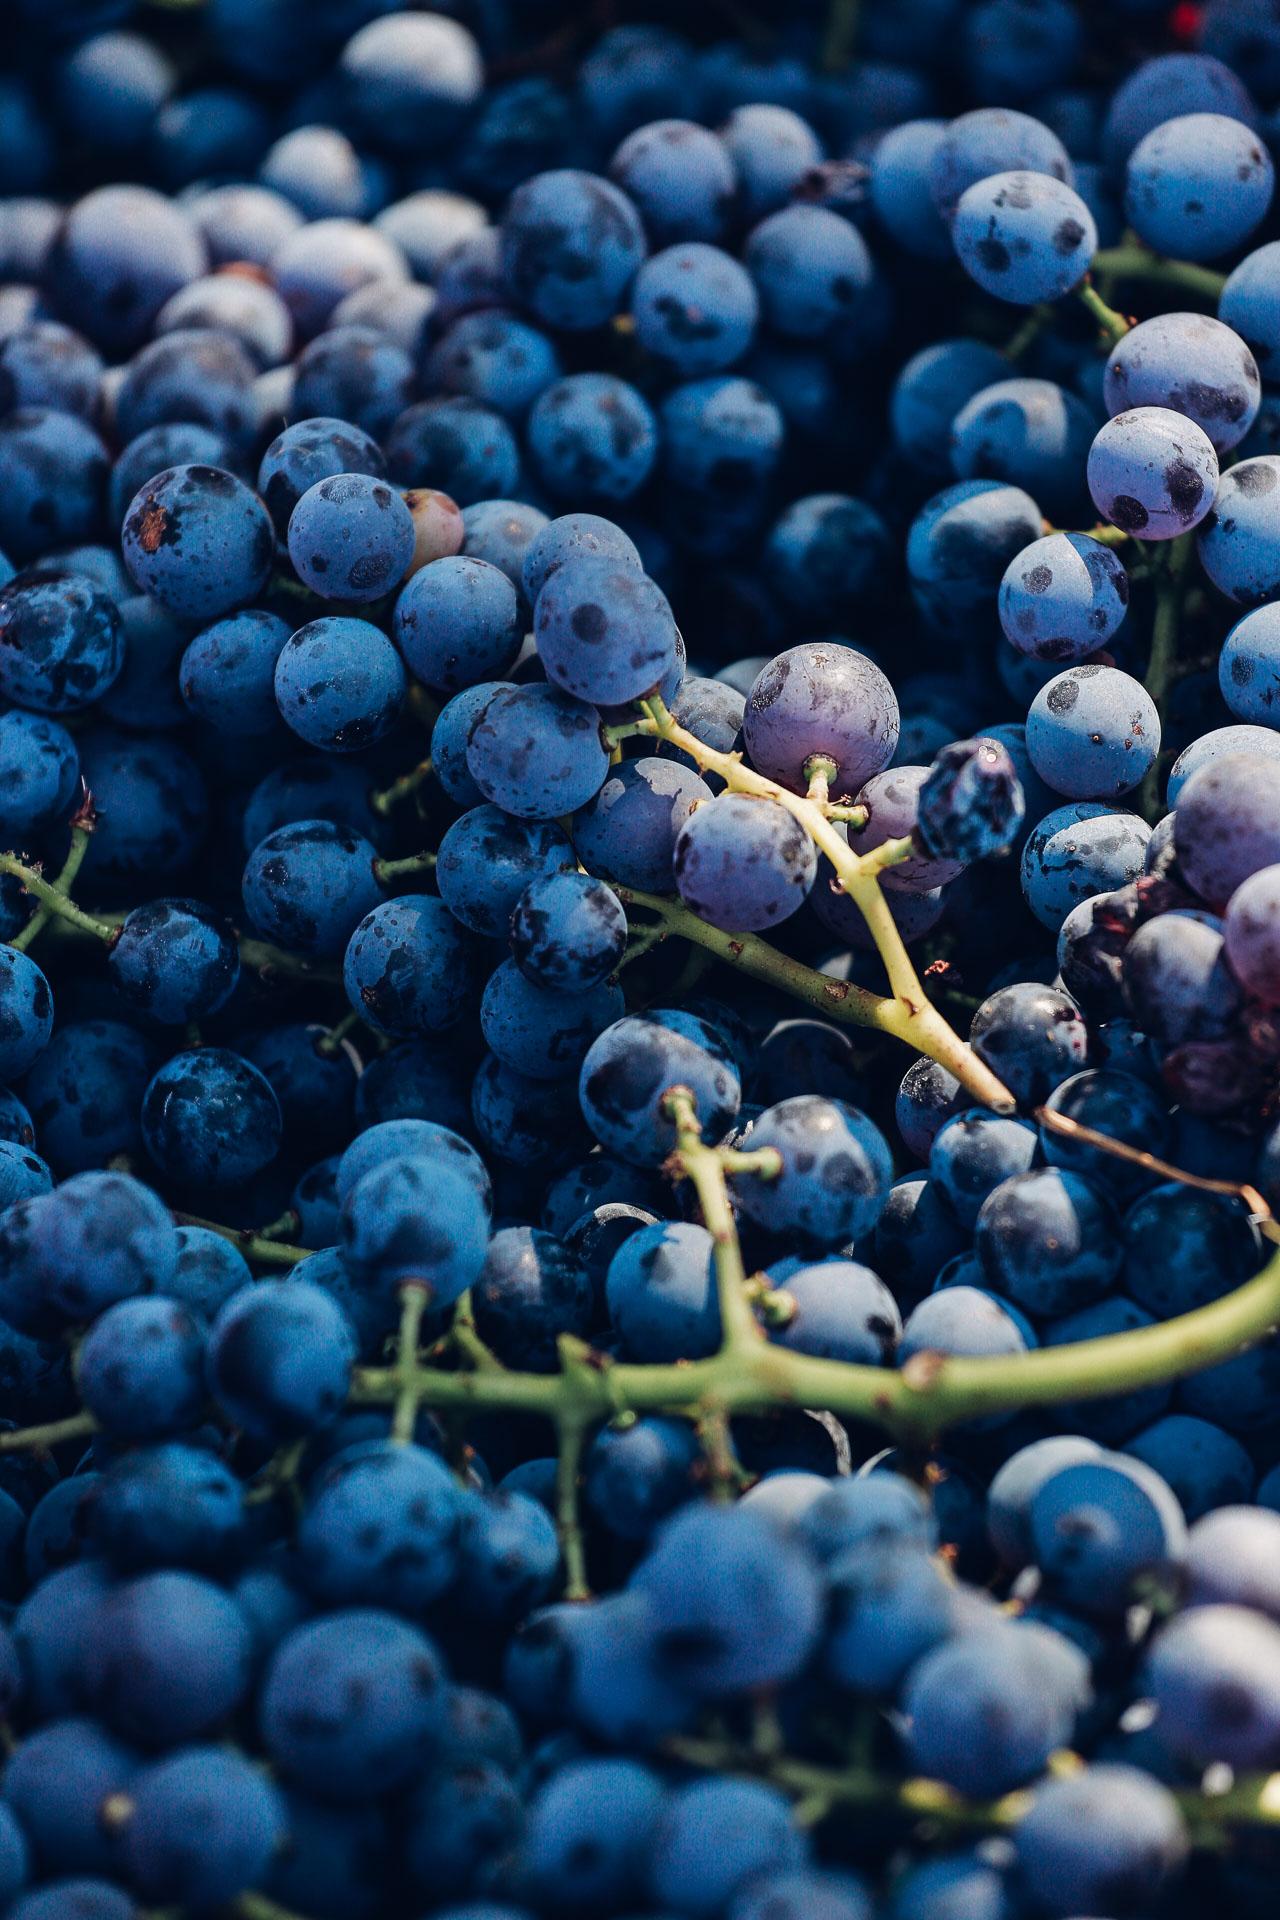 023-Sauro-maule-wineyards-organic-harvest-2016-_RUI7319_p_Lr_web_HD